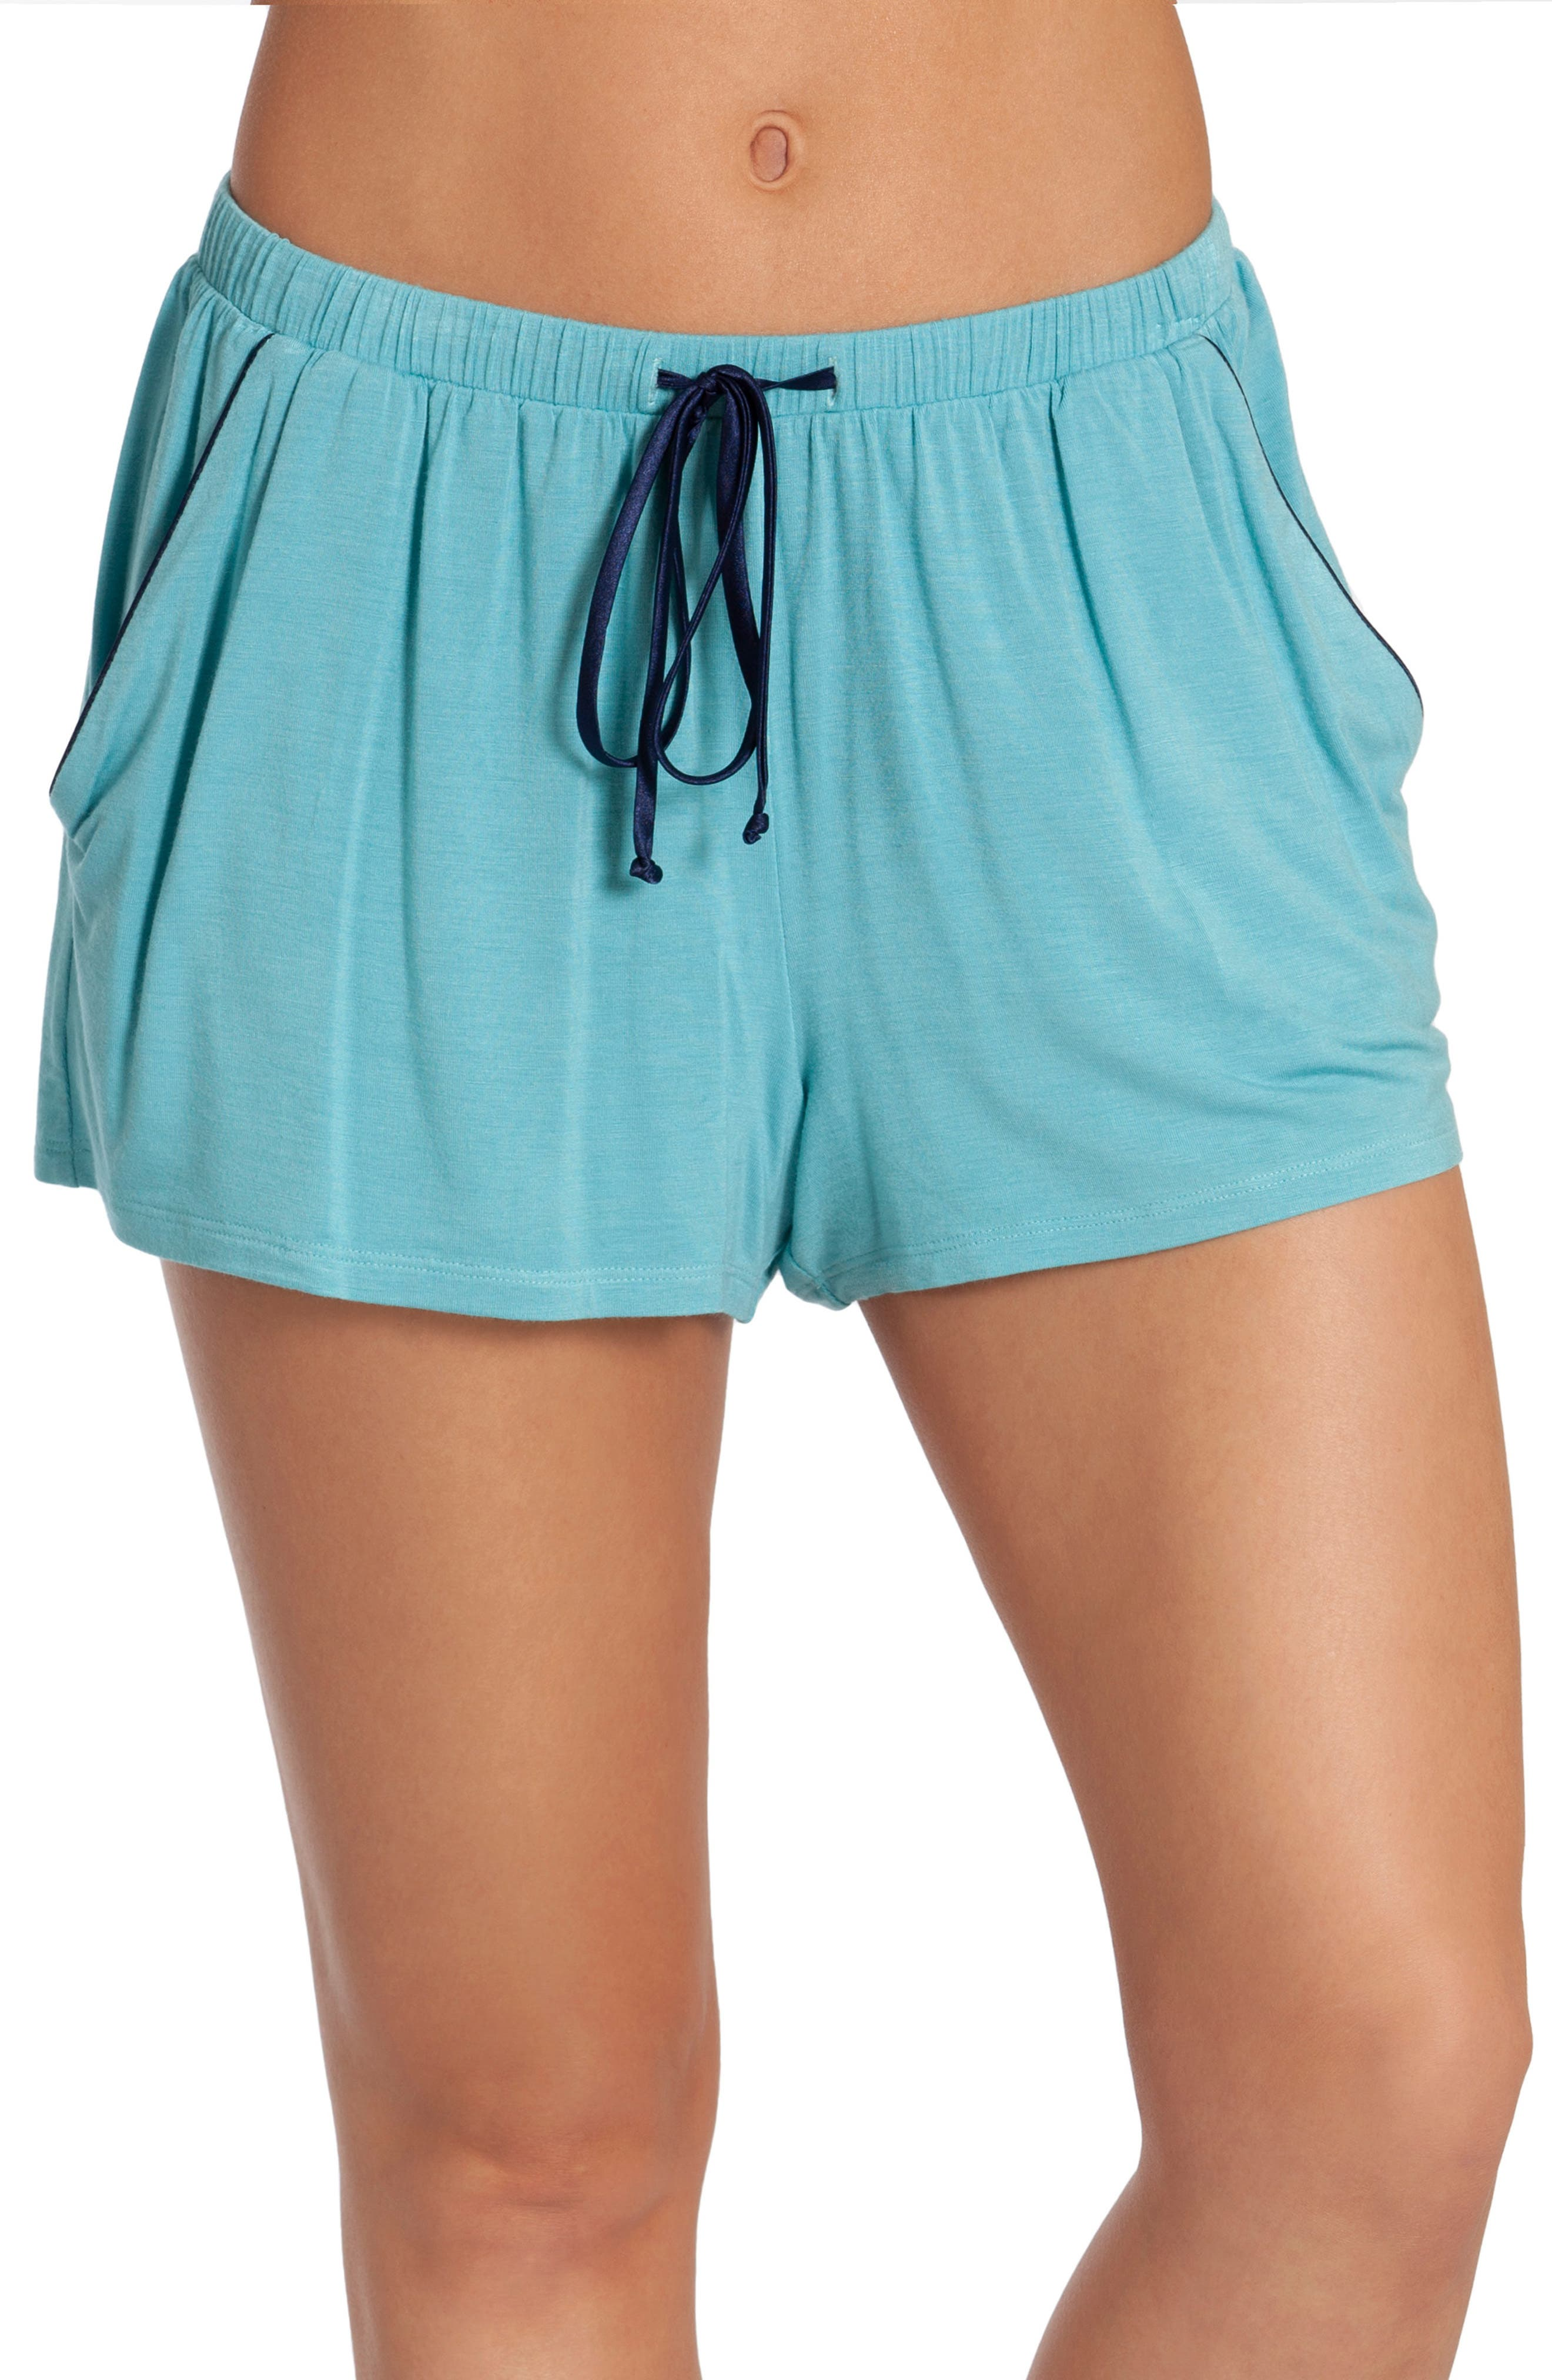 In Bloom By Jonquil Kauai Pajama Shorts, Blue